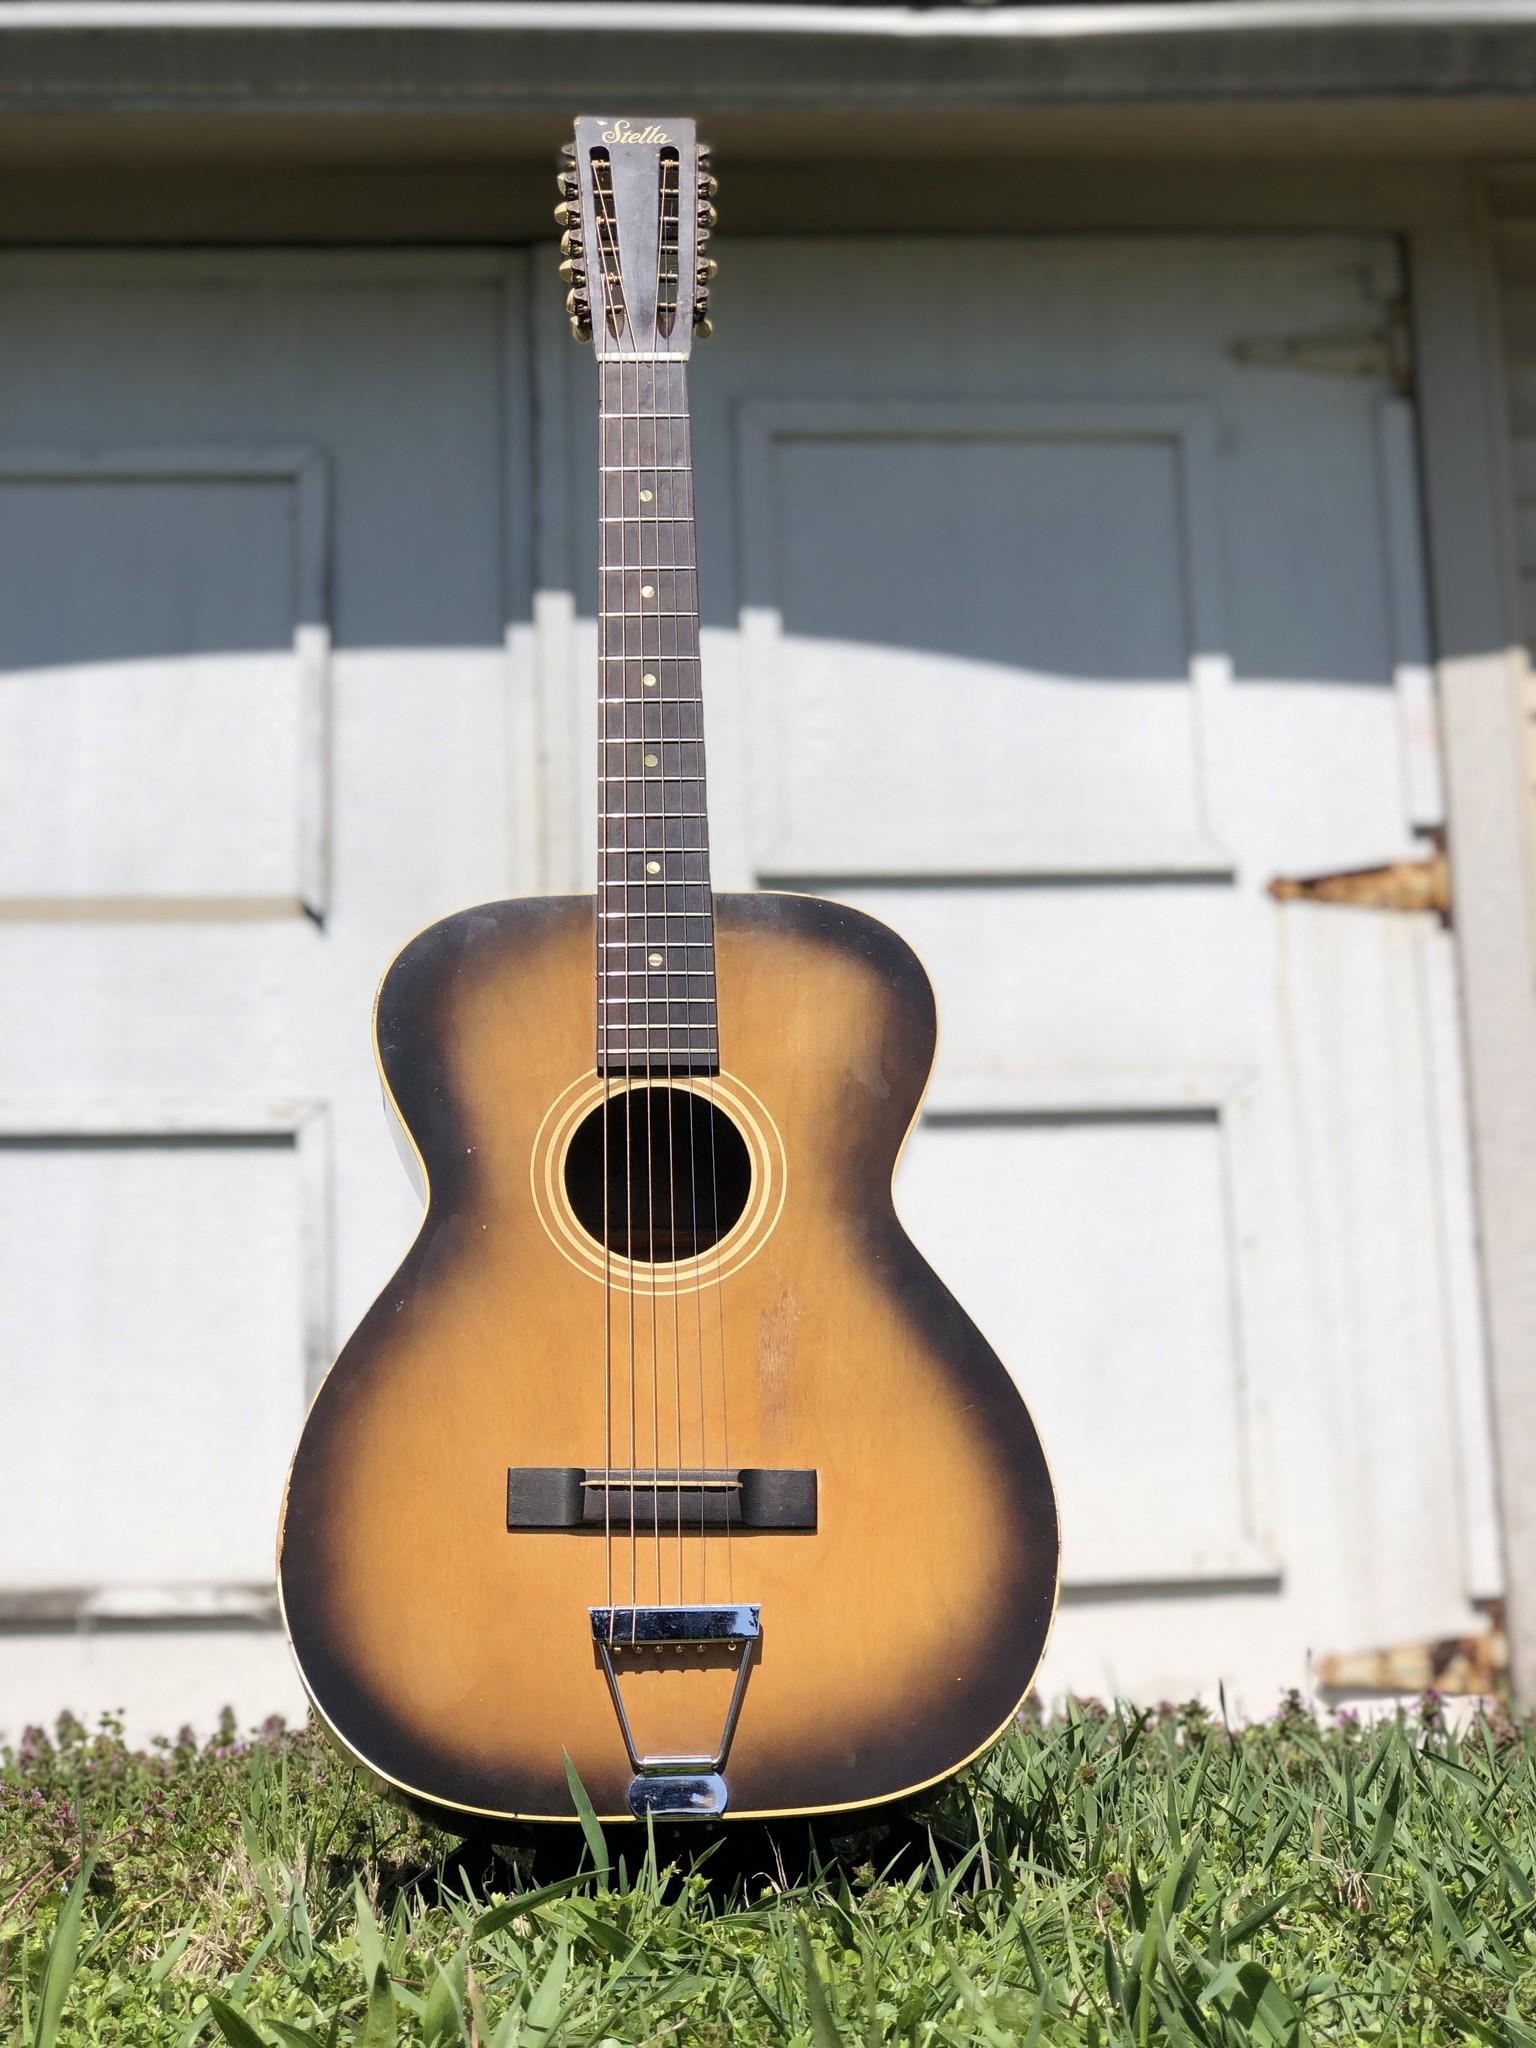 1960s Stella 12-string (strung up for 6 string) 7164 H922-1